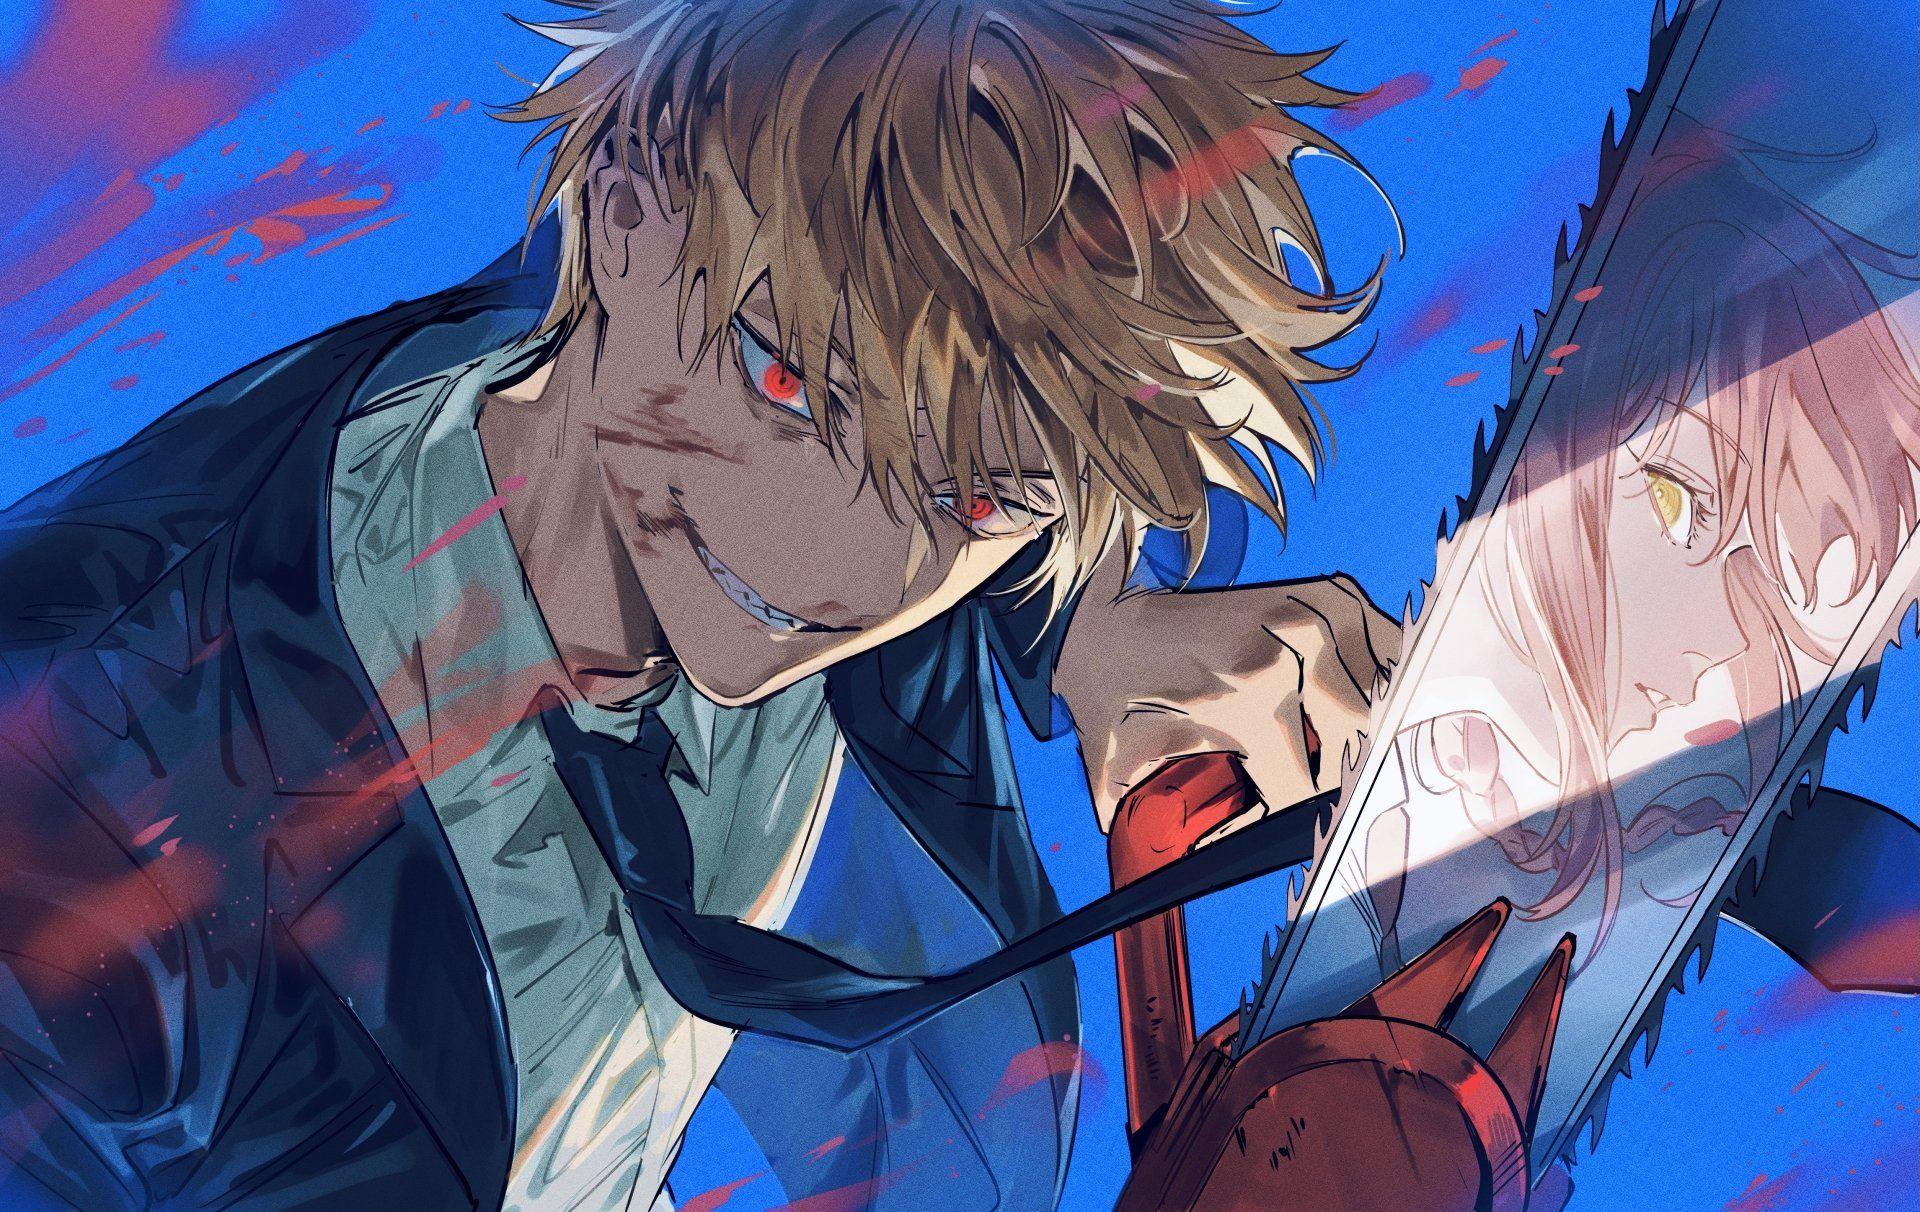 Chainsaw Man Anime Episode 1: Premiere Date & Spoilers